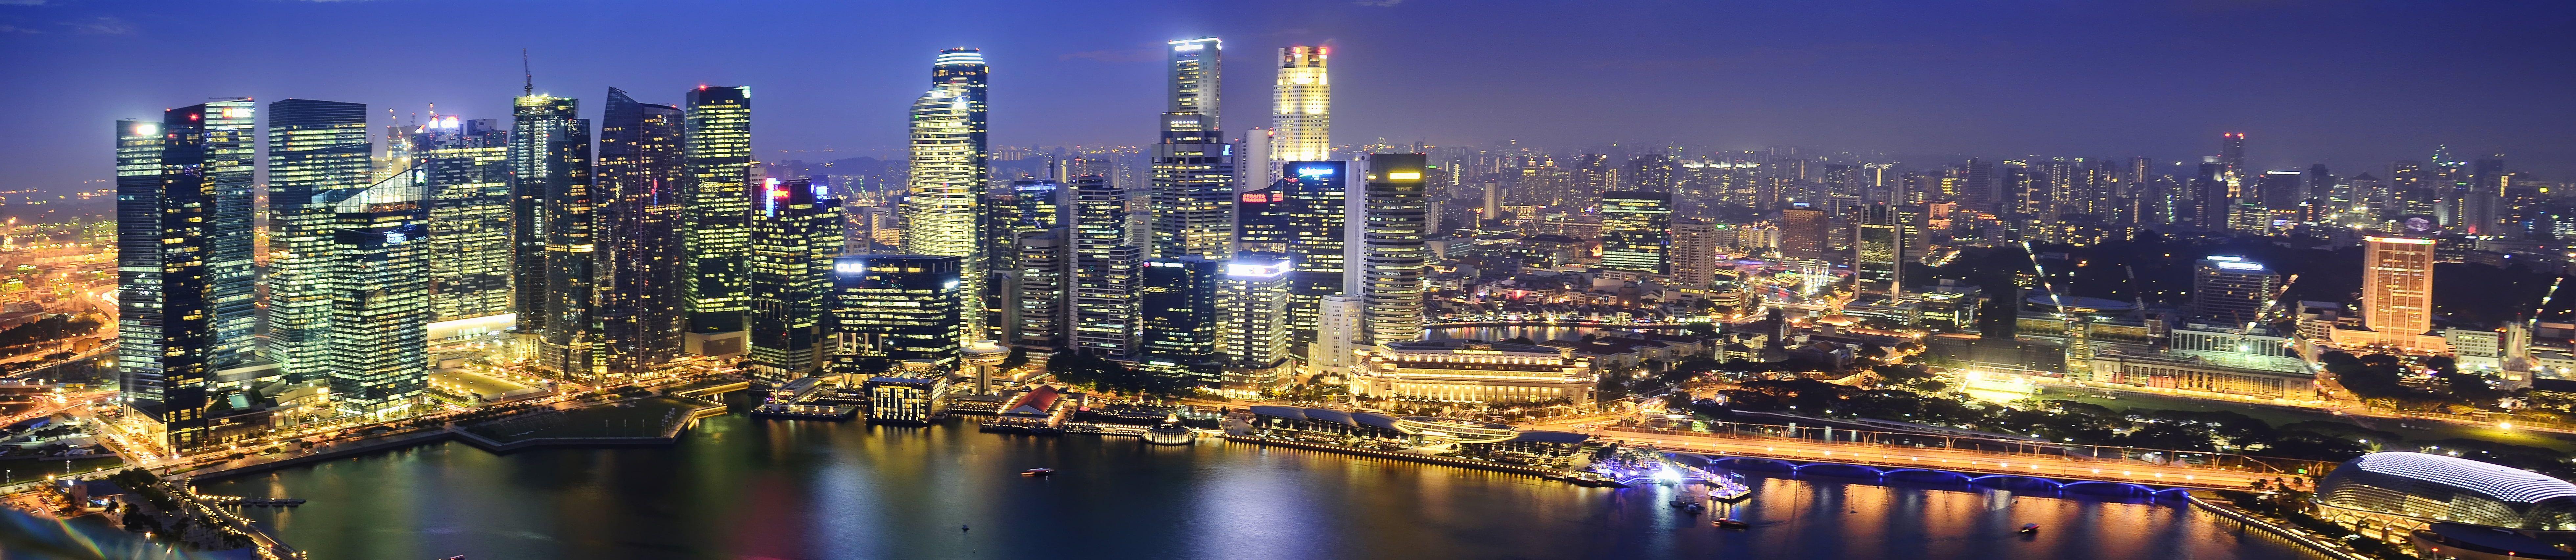 panorama photo of city near body of water during night tiem #fallwallpaperiphone